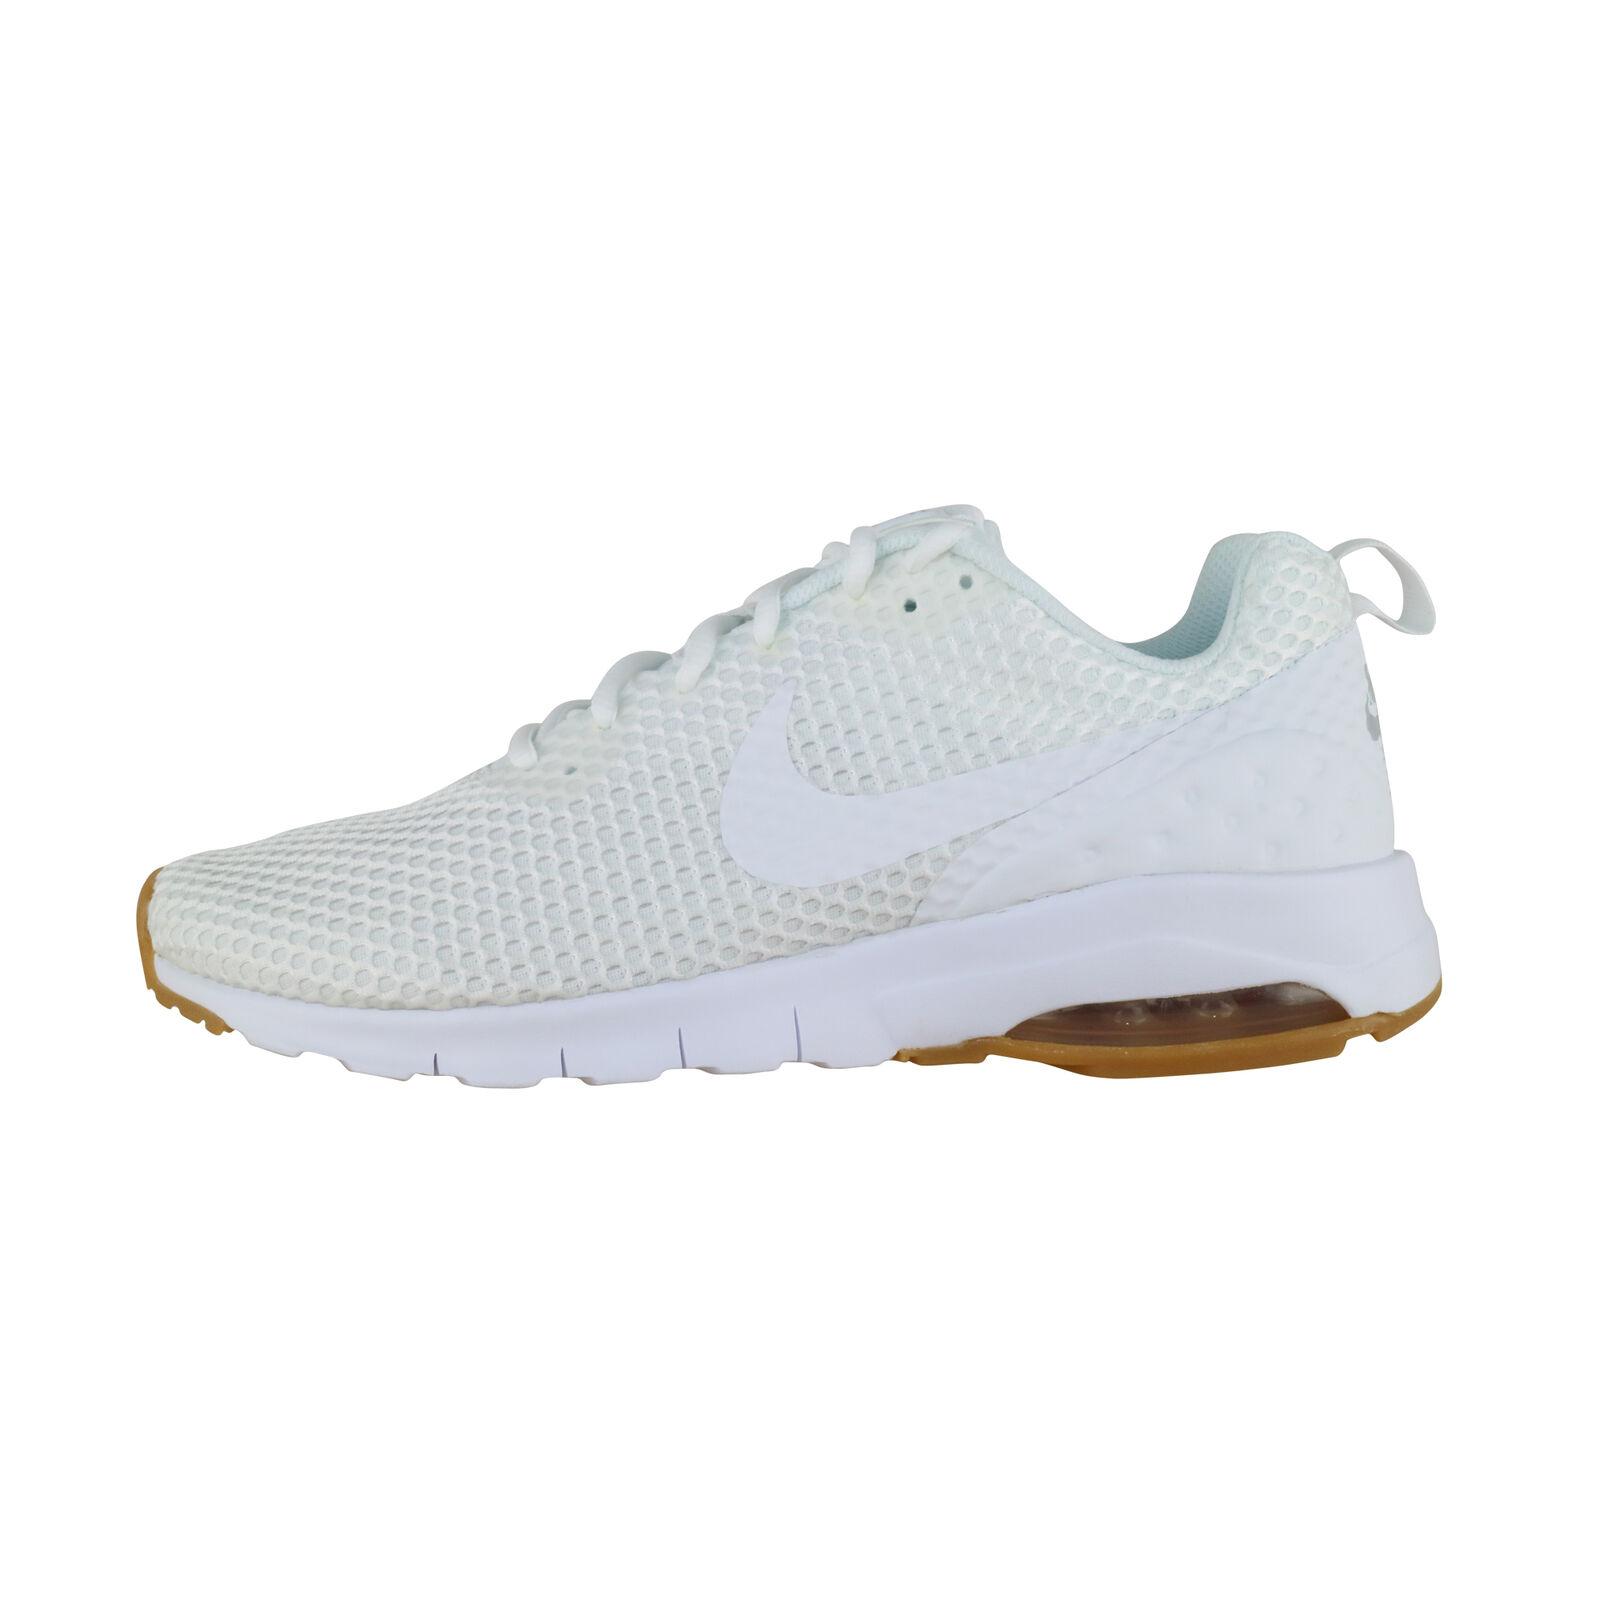 Nike Air Max Motion LW SE 844836-101